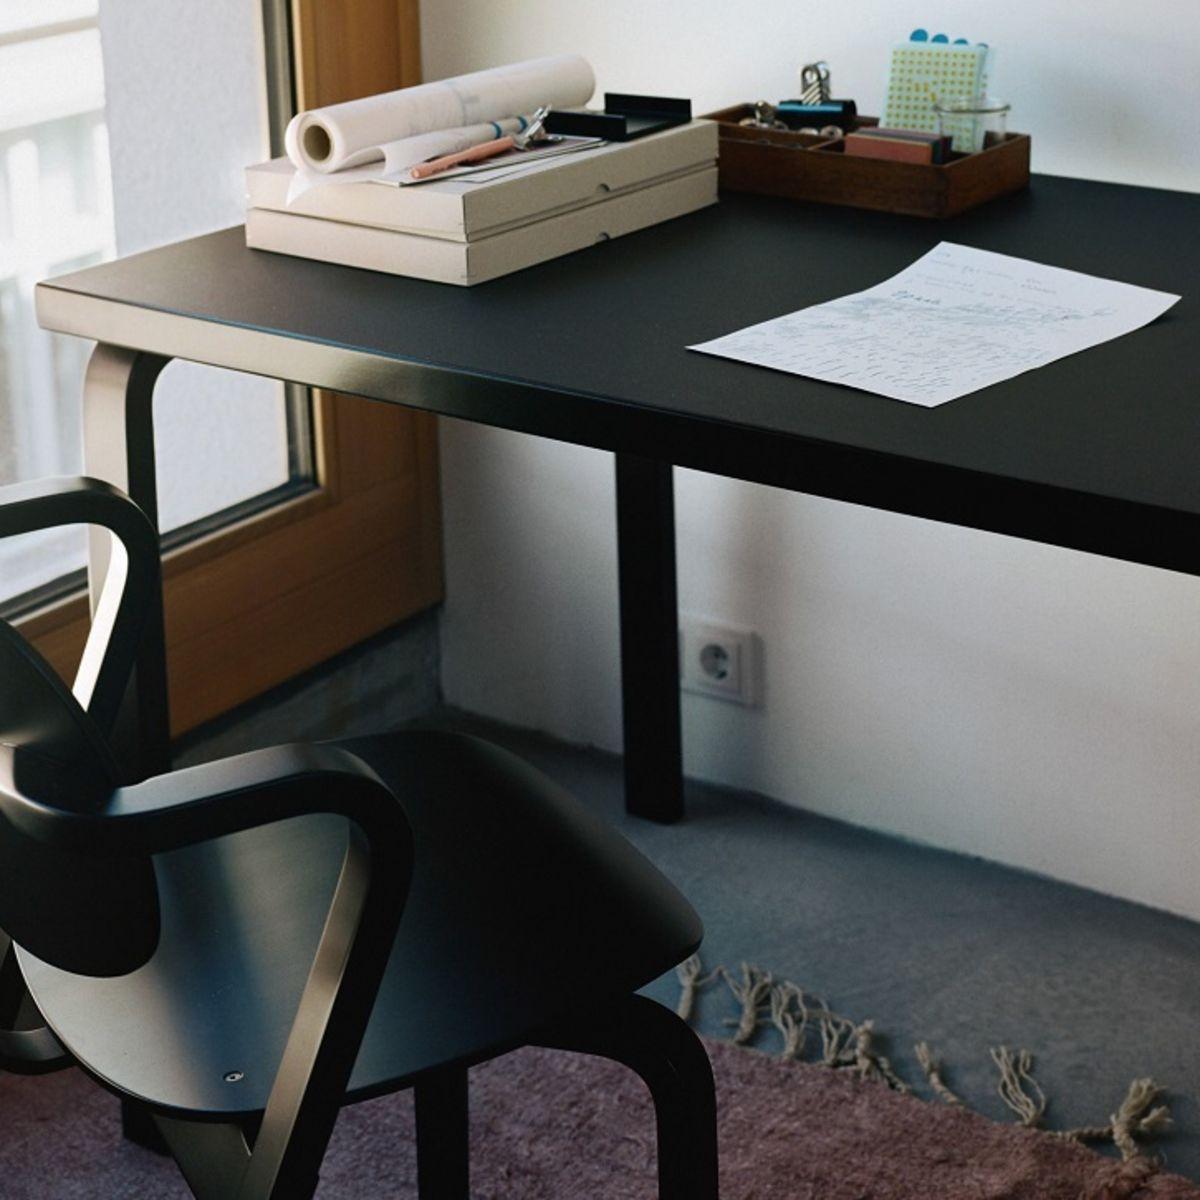 2387528_Aslak_Chair_Aalto_Table_rectangular_black_lacquer_master